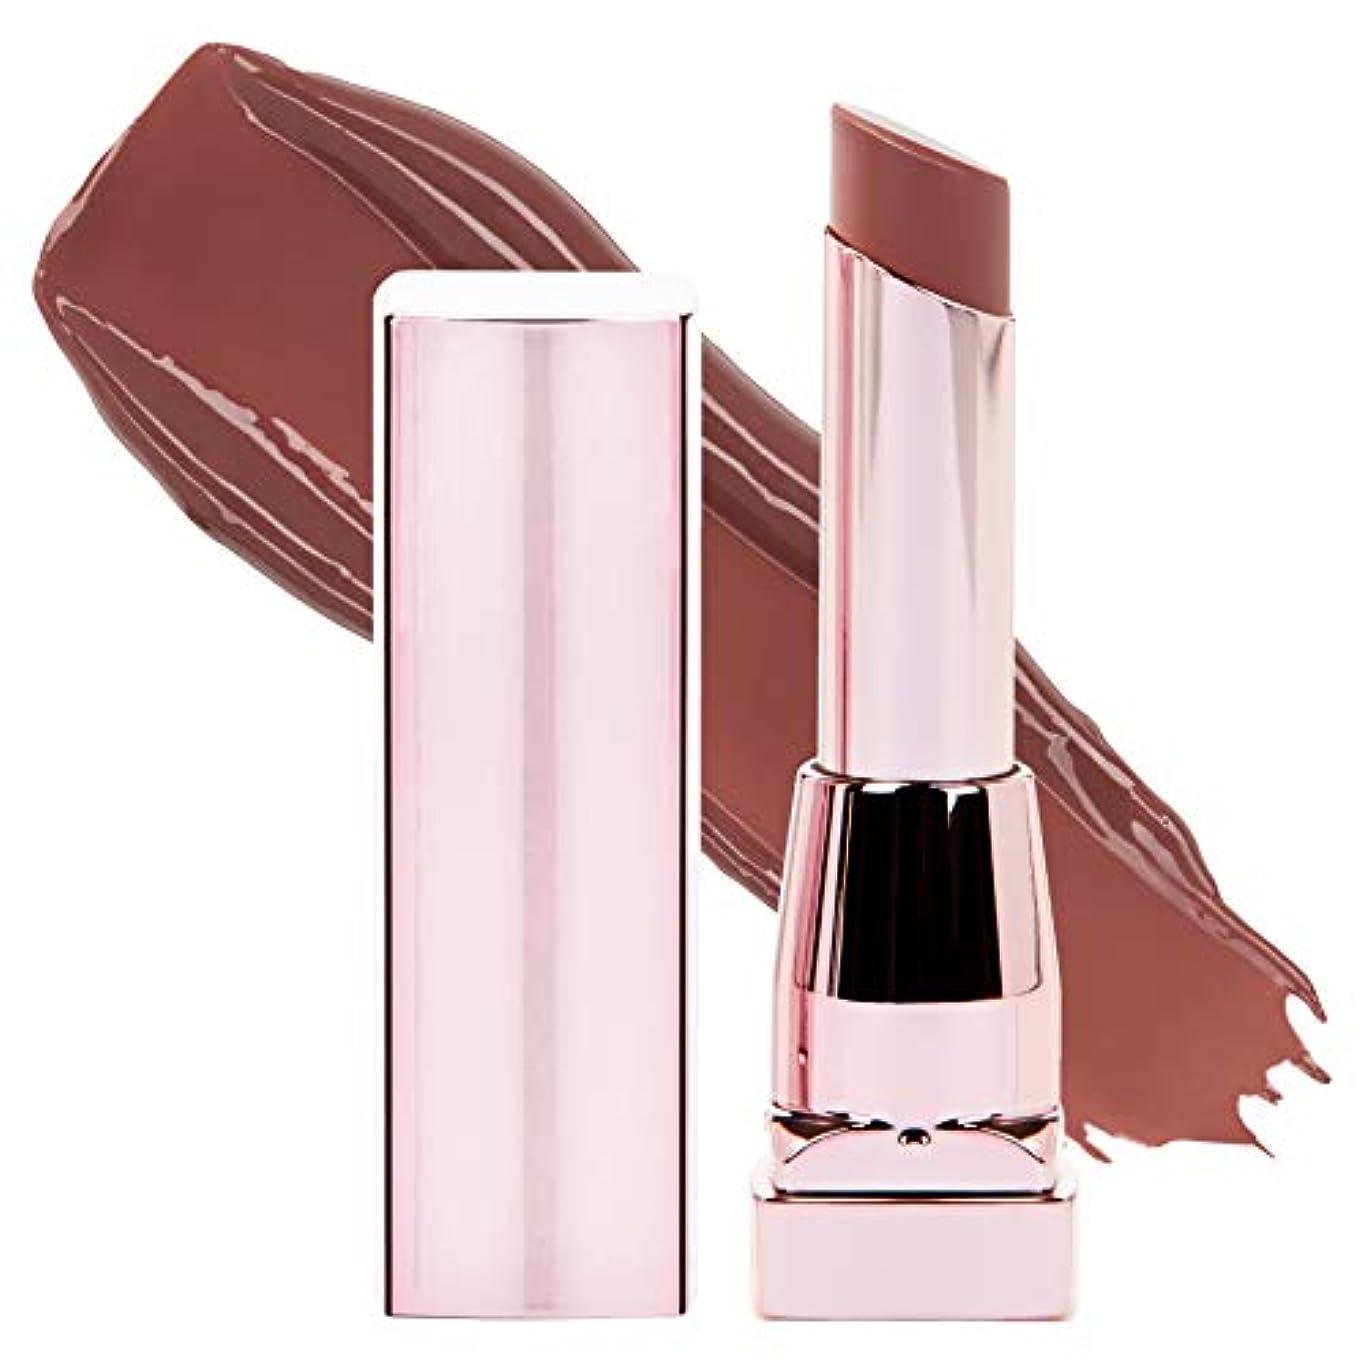 MAYBELLINE Color Sensational Shine Compulsion Lipstick - Spicy Mauve 065 (並行輸入品)